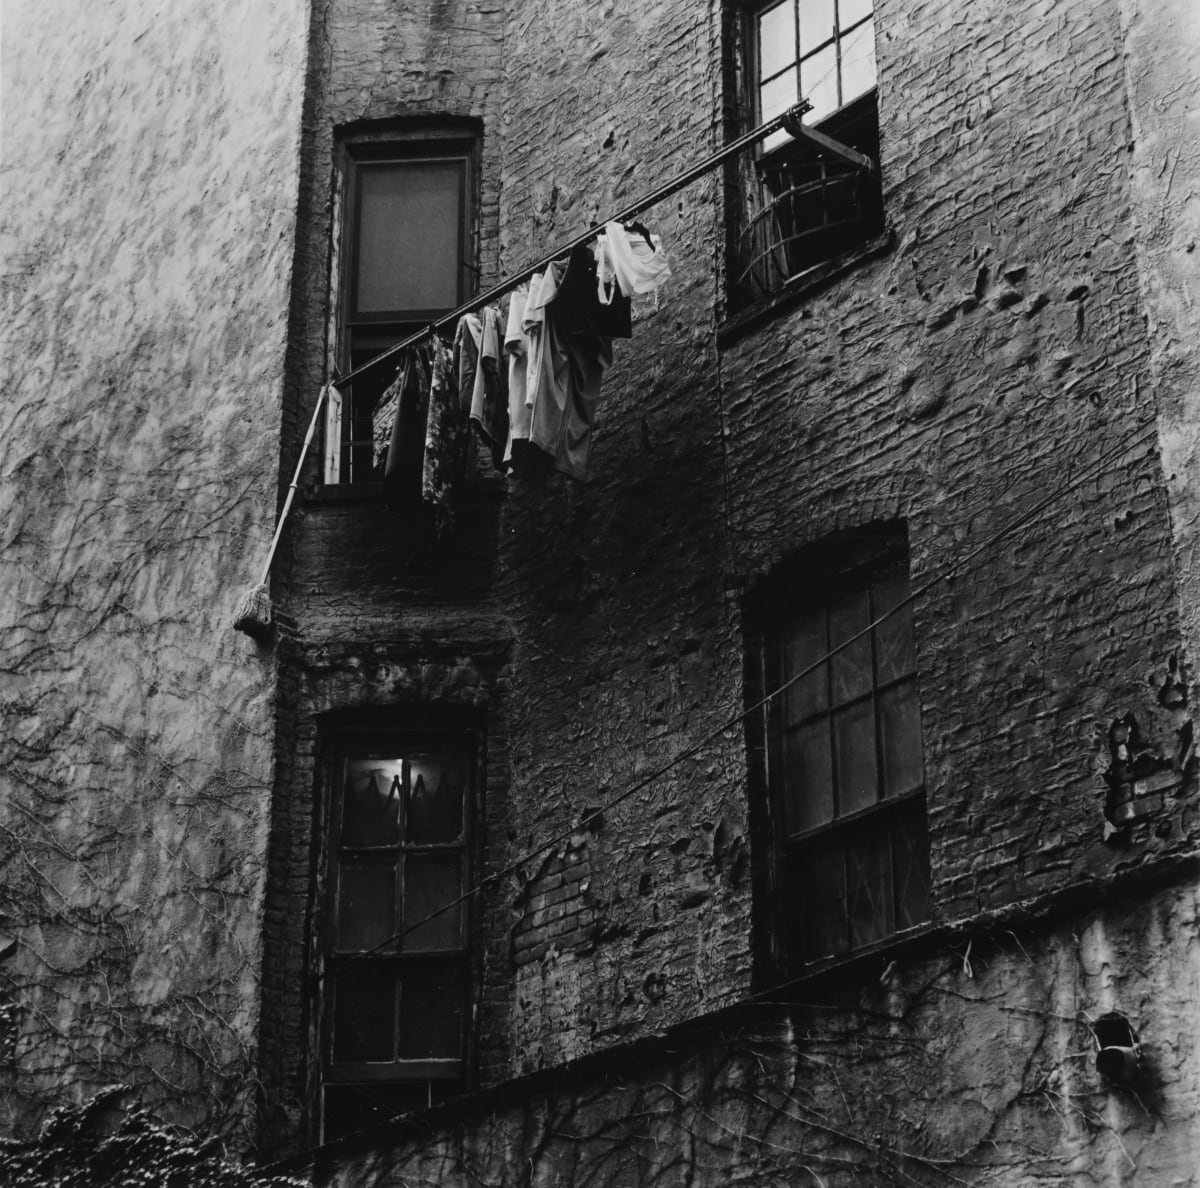 "Ernesto Esquer Chinatown, Manhattan, NYC, 2018, printed 2019 Gelatin Silver print Image 6.5 x 7"", paper 8 x 10"", mat 11 x 14"" 1/20"